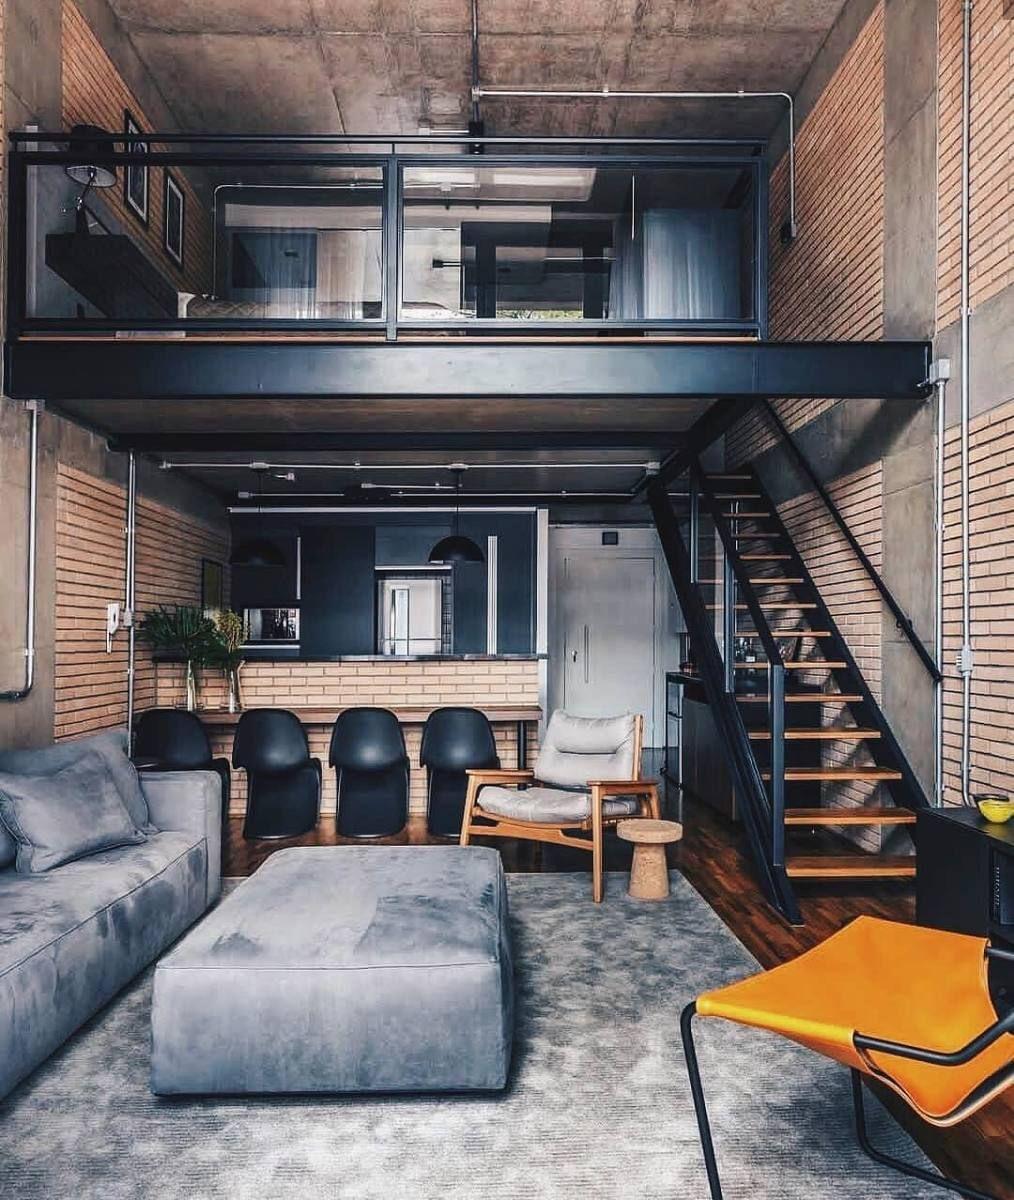 Random inspiration 332 ultralinx loft style lofts interior design inspiration home interior